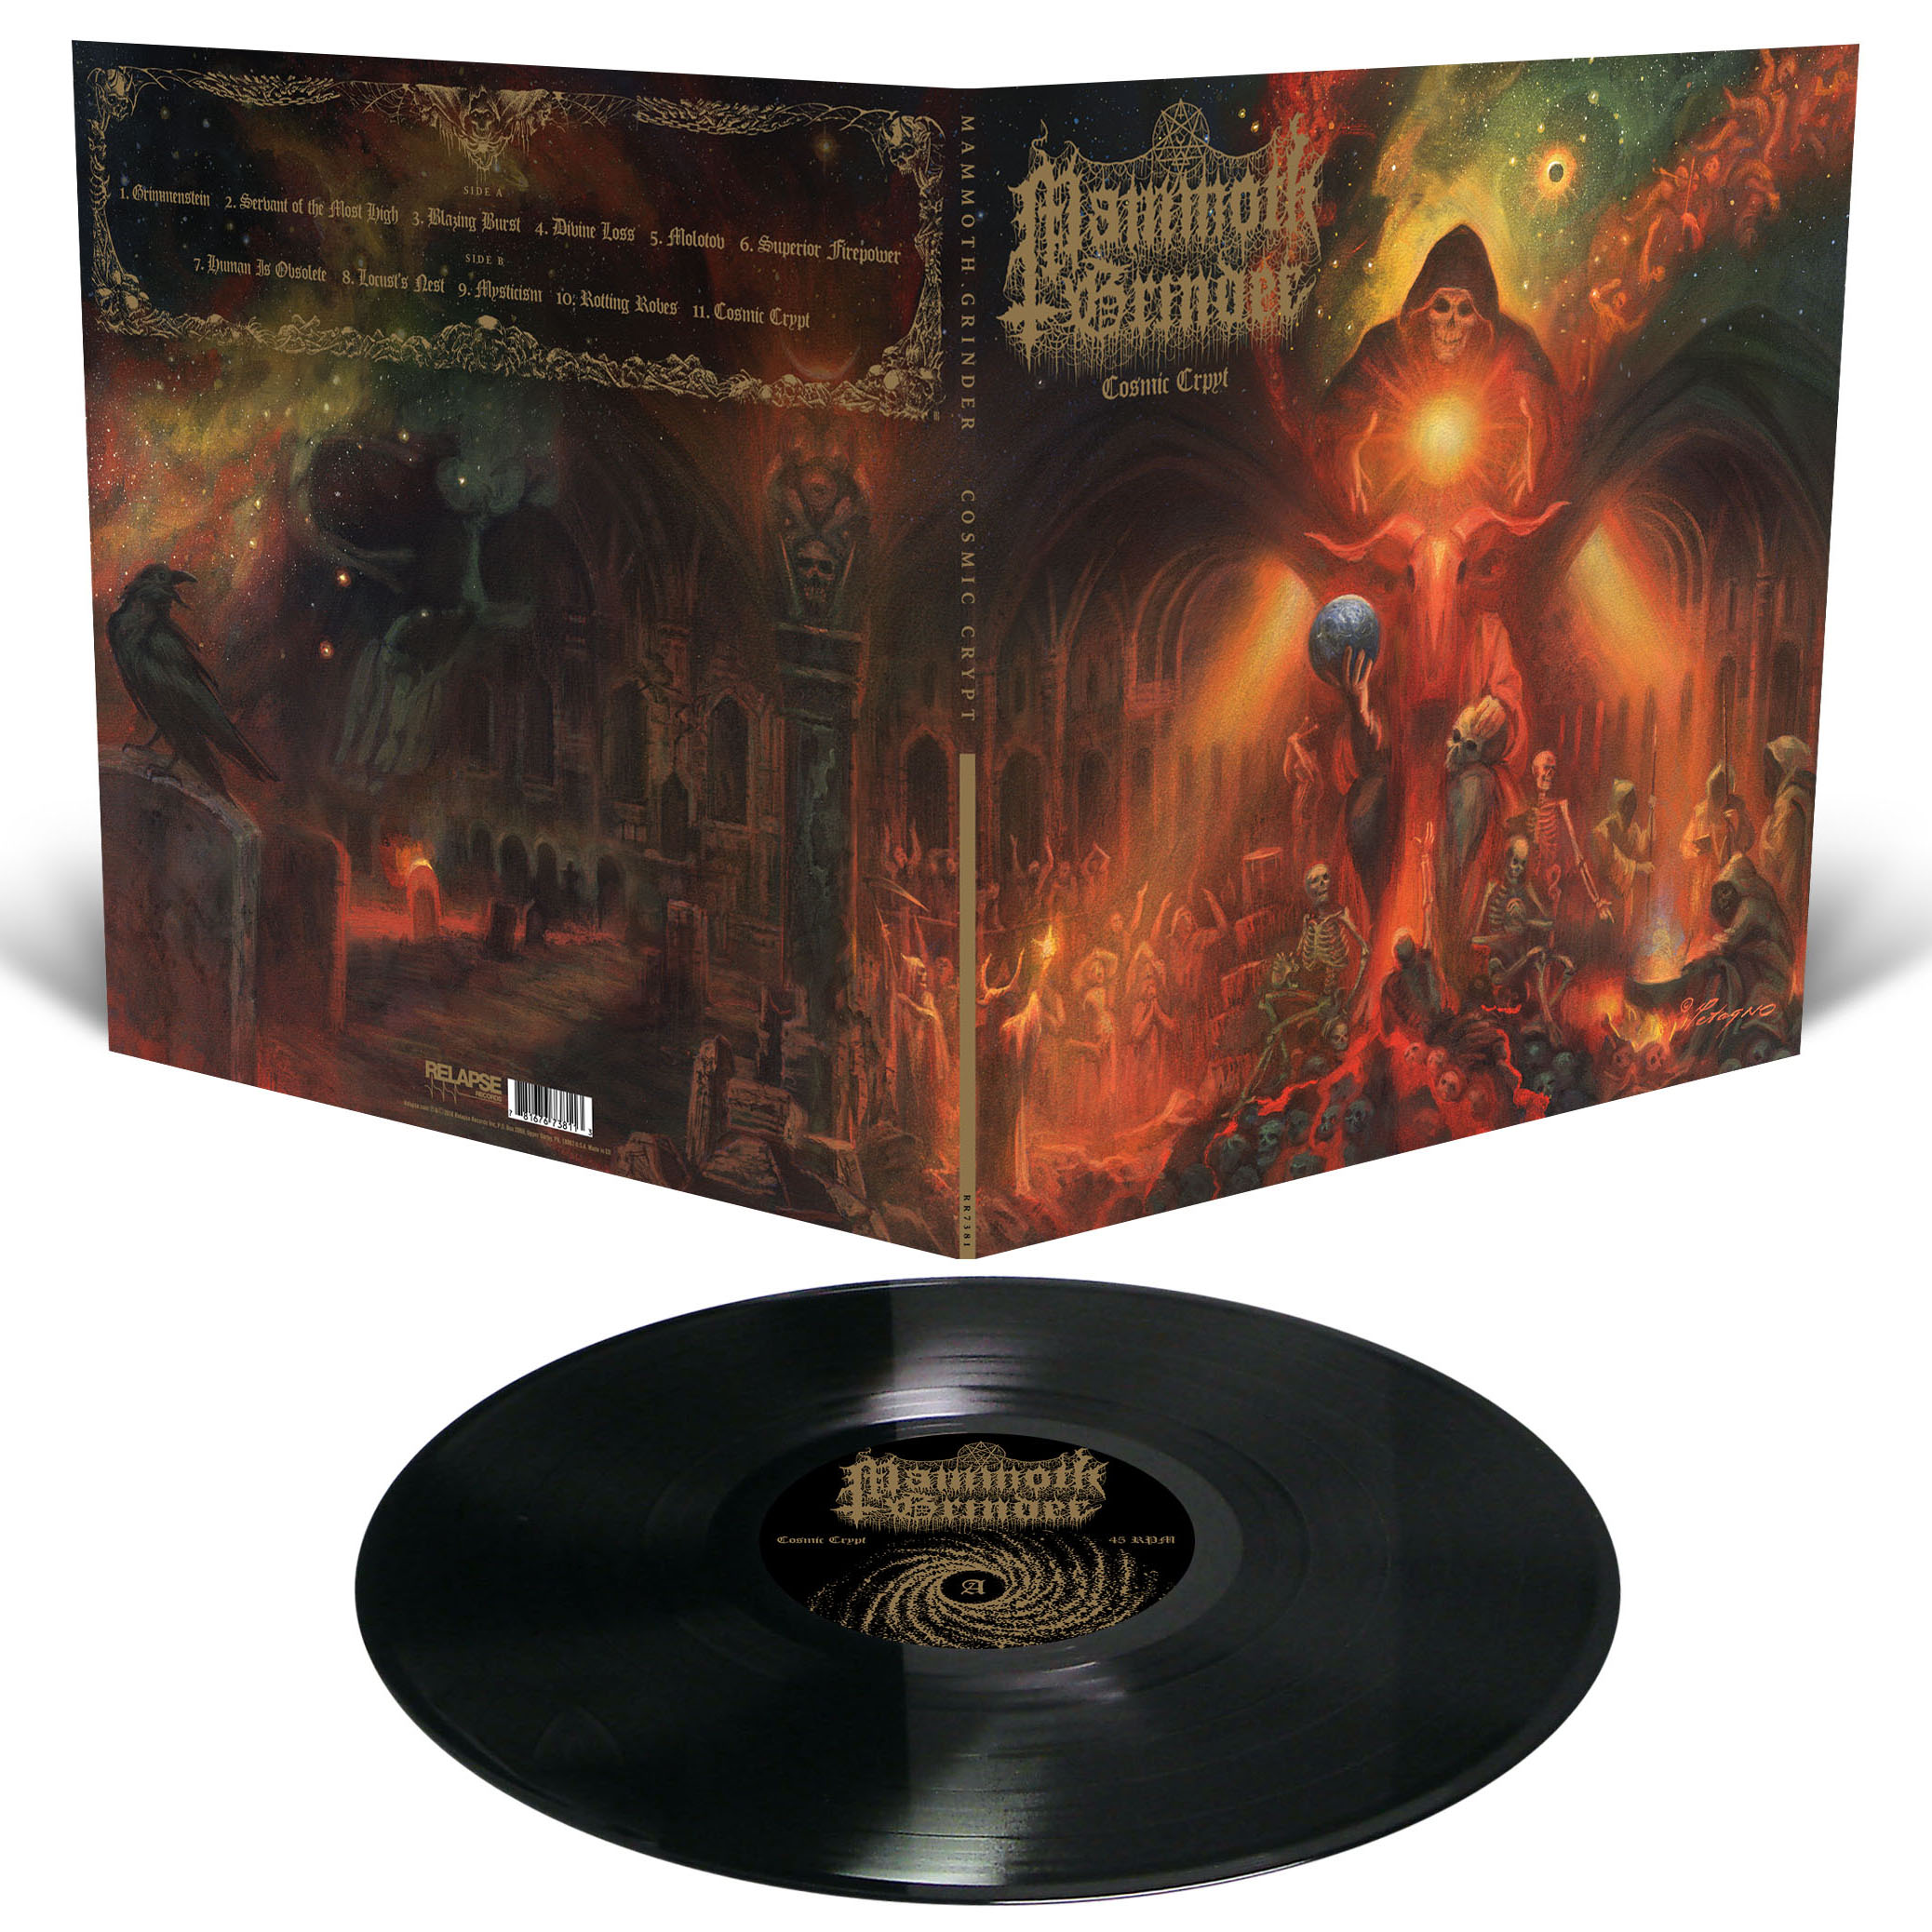 Mammoth Grinder Cosmic Crypt Vinyl Lp Black Bigo 251 T